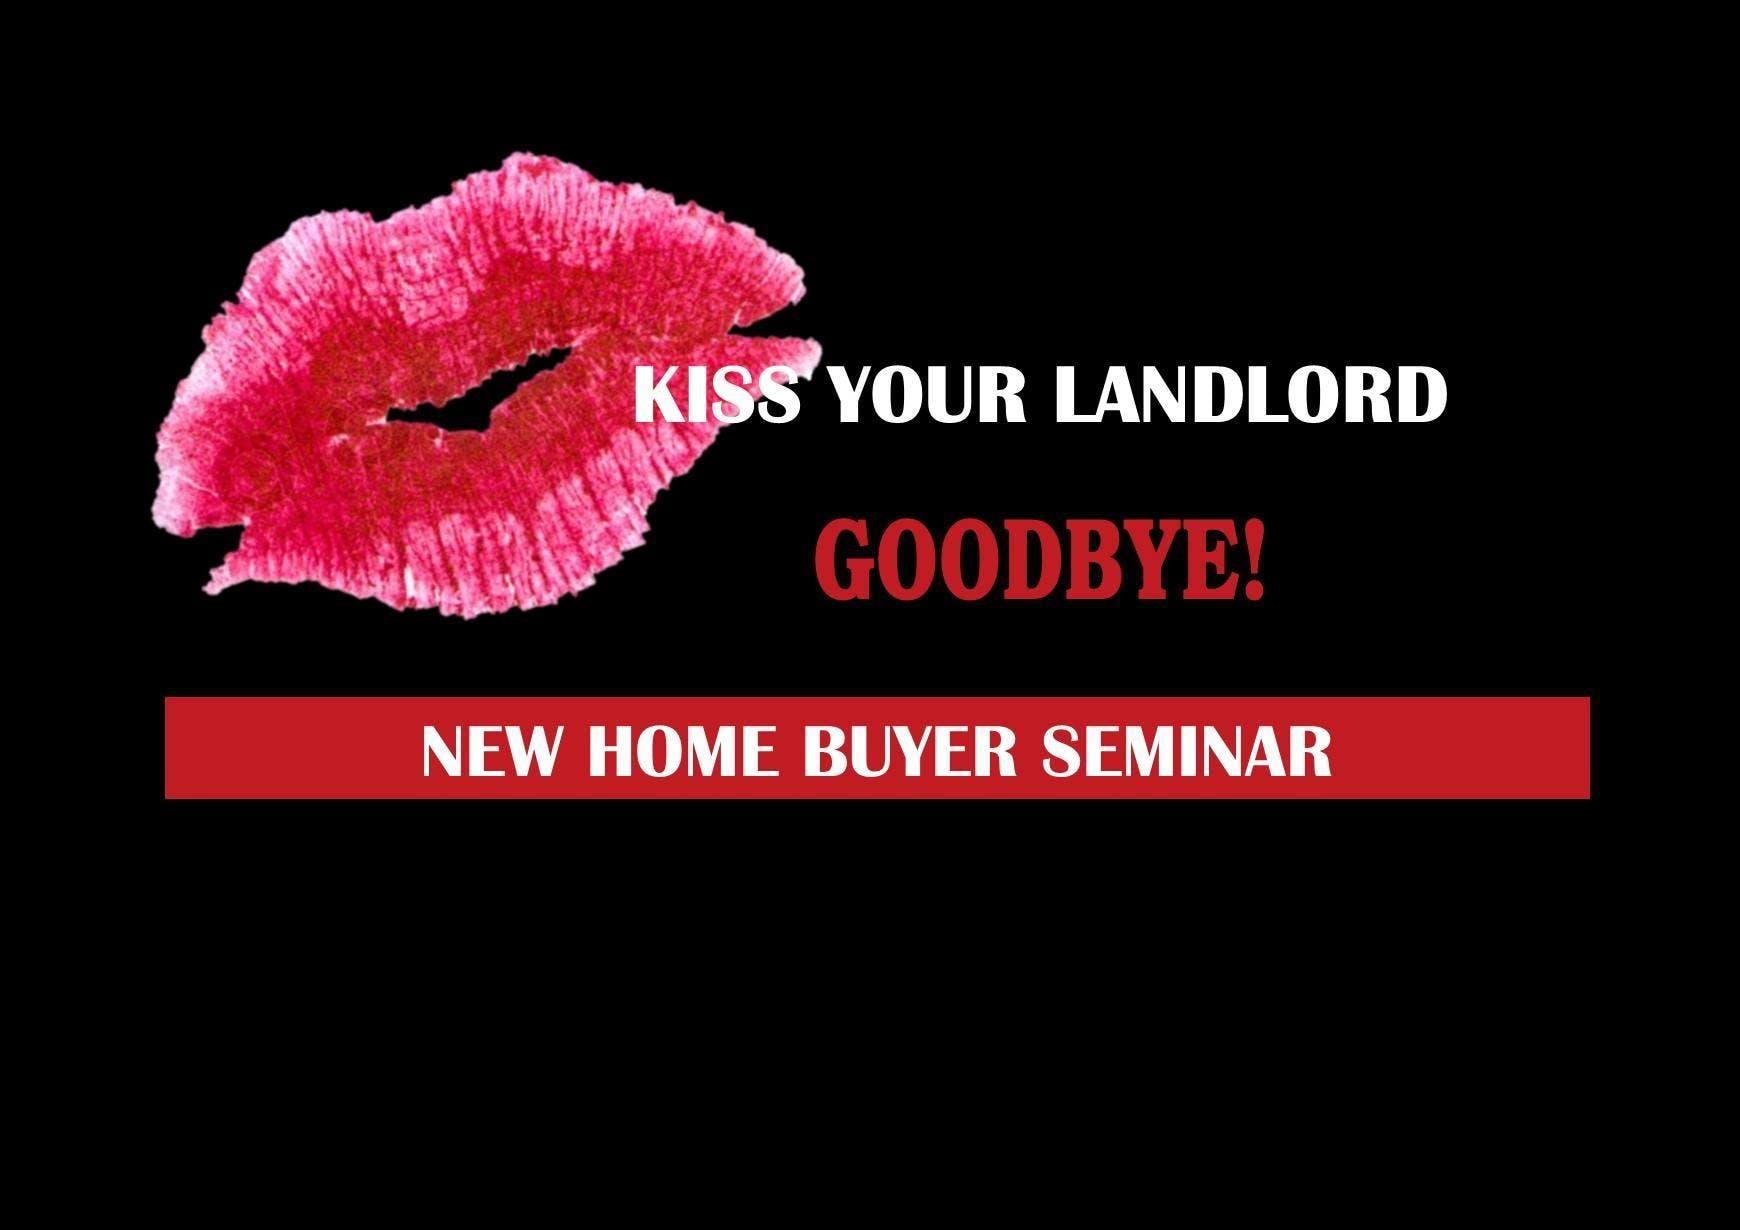 Home Buyers Seminar May 22 2018